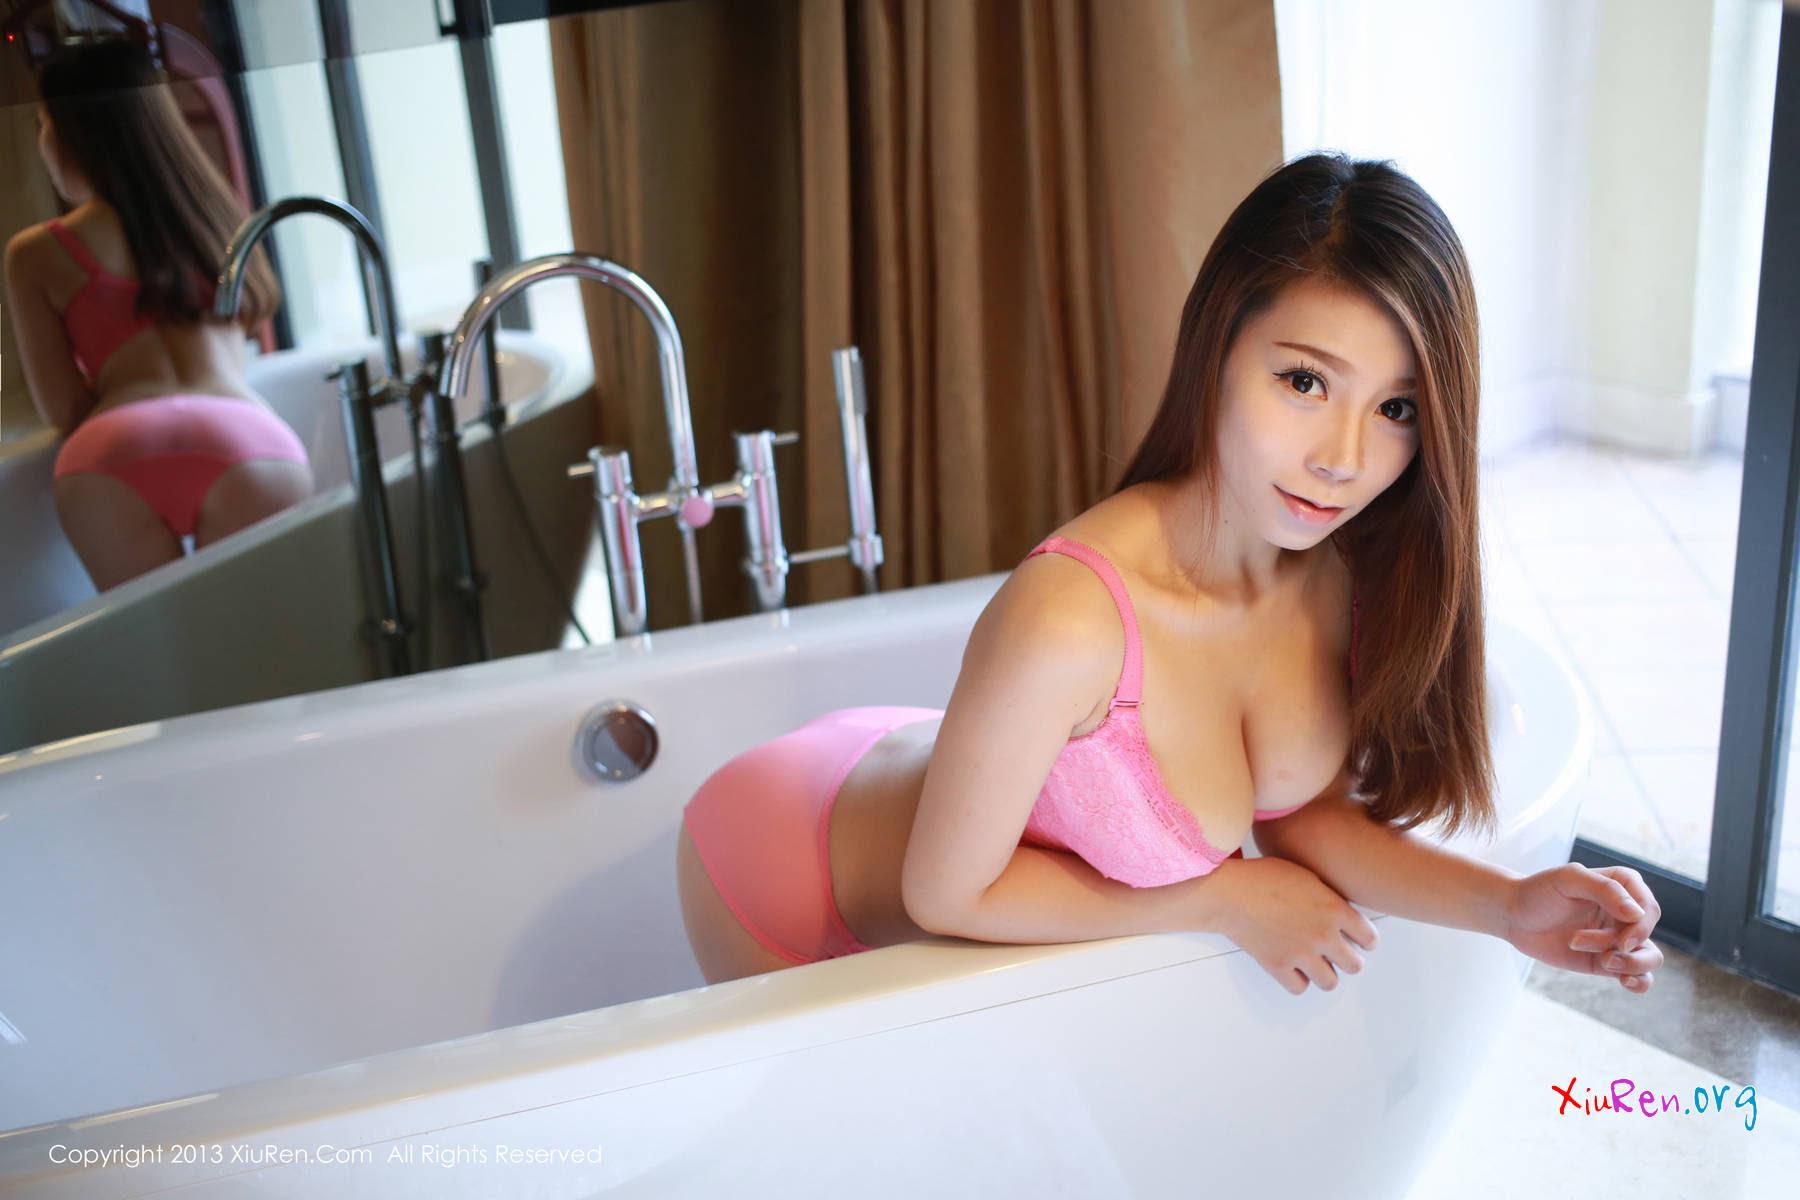 phimvu blog-XiuRen-N00058-vetiver-0005.jpg